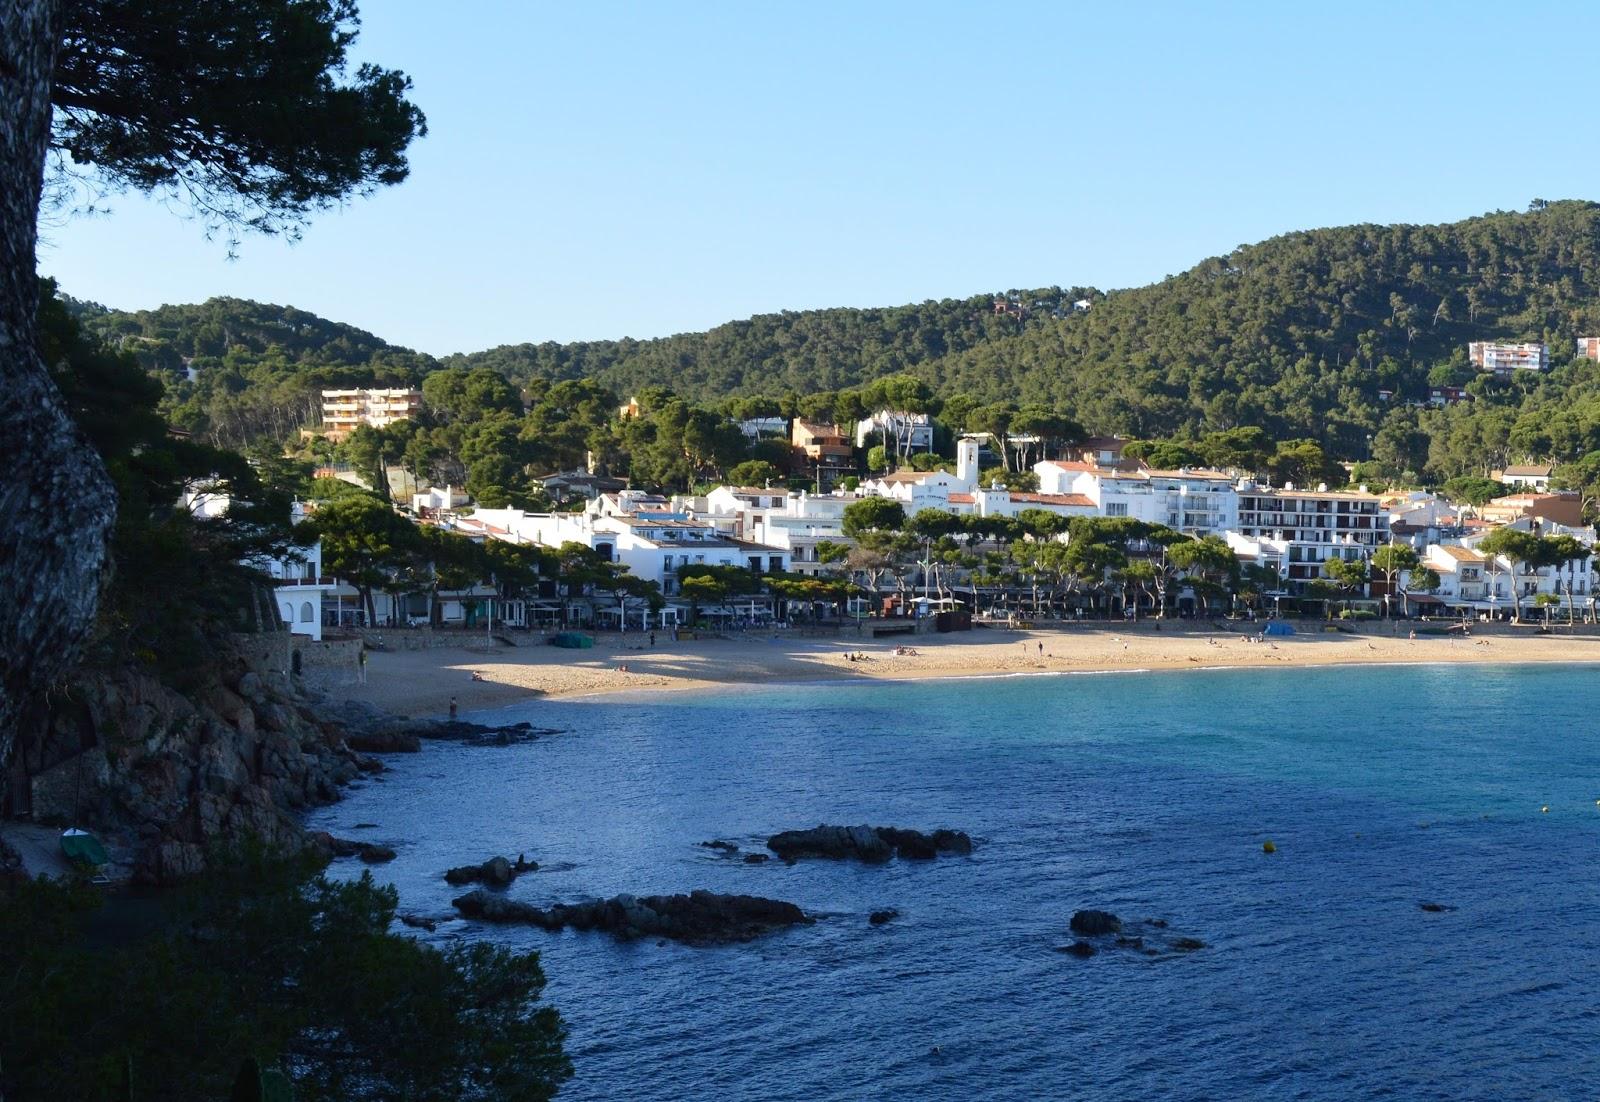 A walk from Calella de Palafrugell to Llafranc